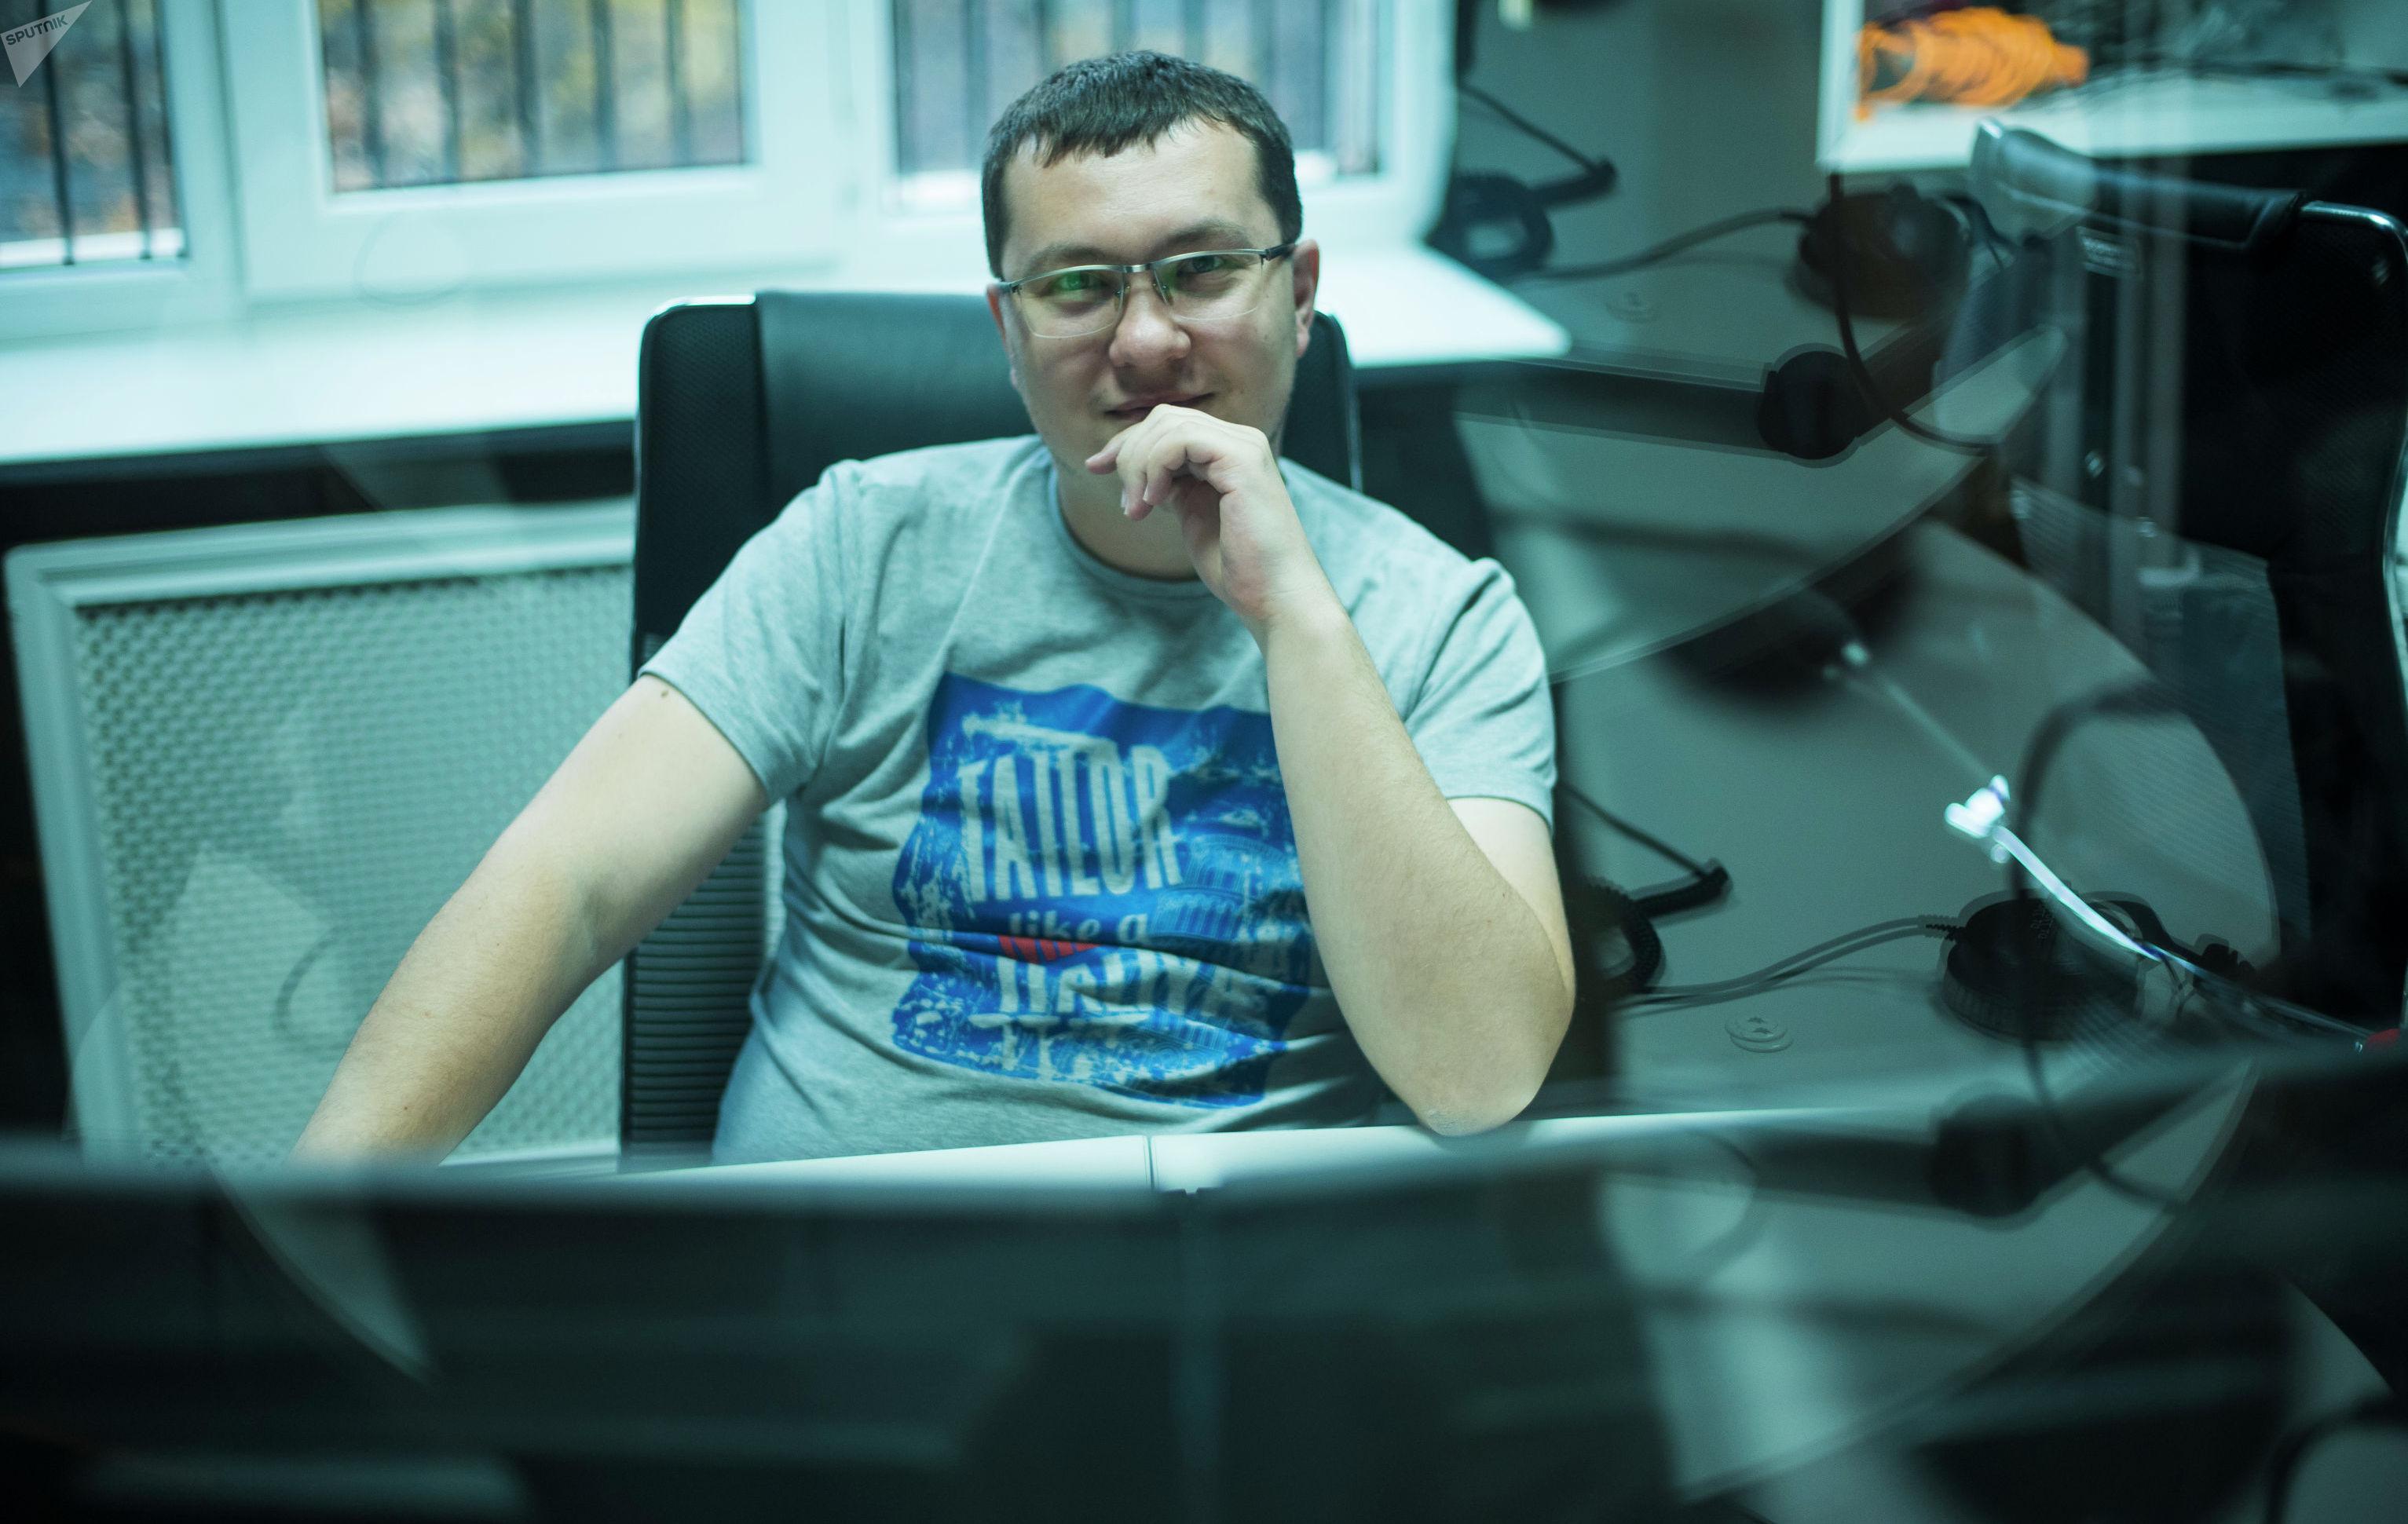 Звукорежиссер радио Sputnik Кыргызстан Максим Марочкин